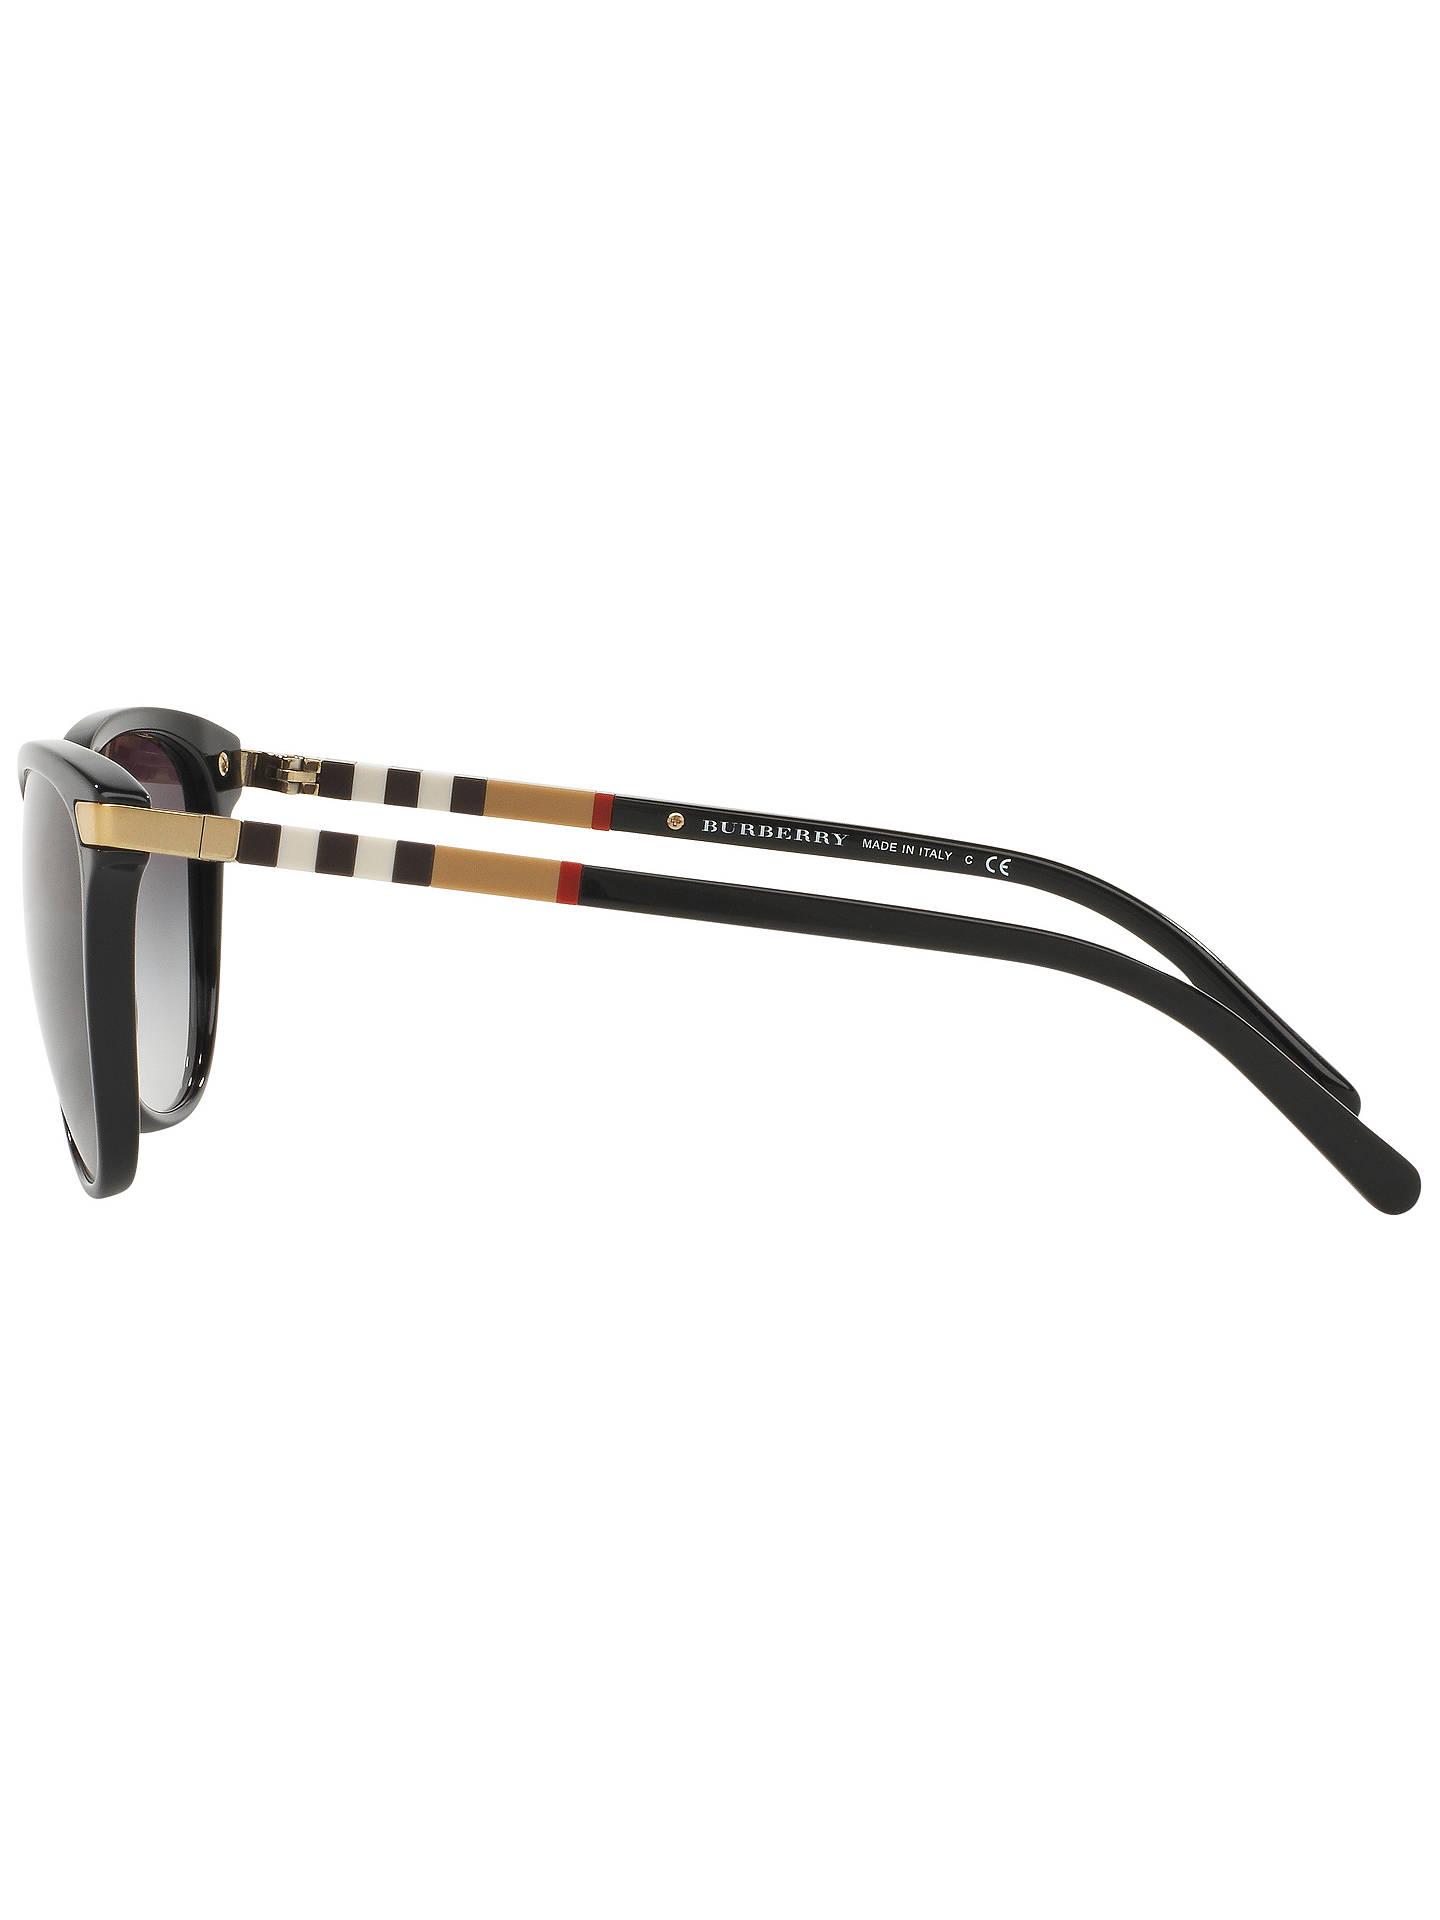 66255e2a9641 ... Buy Burberry BE4216 Cat s Eye Gradient Sunglasses